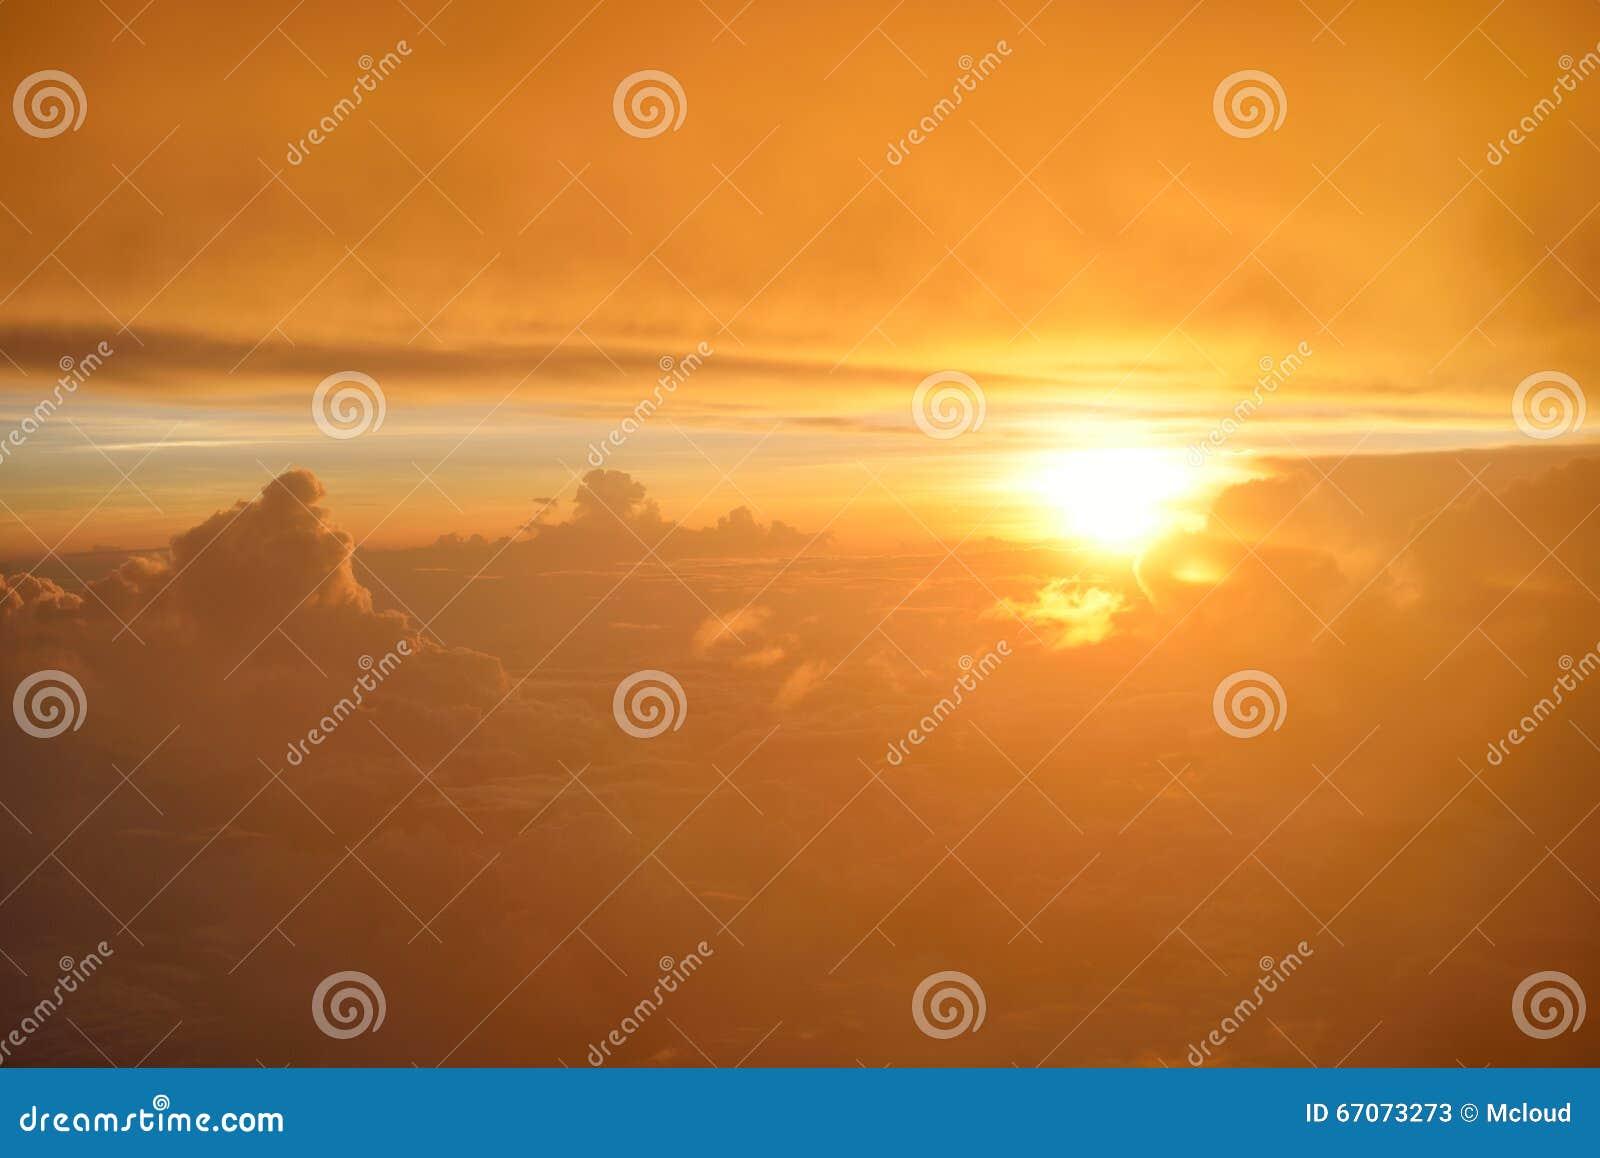 Spectaculaire mening van zonsondergang of zonsopgang boven wolken van vliegtuigvenster Hoogste mening